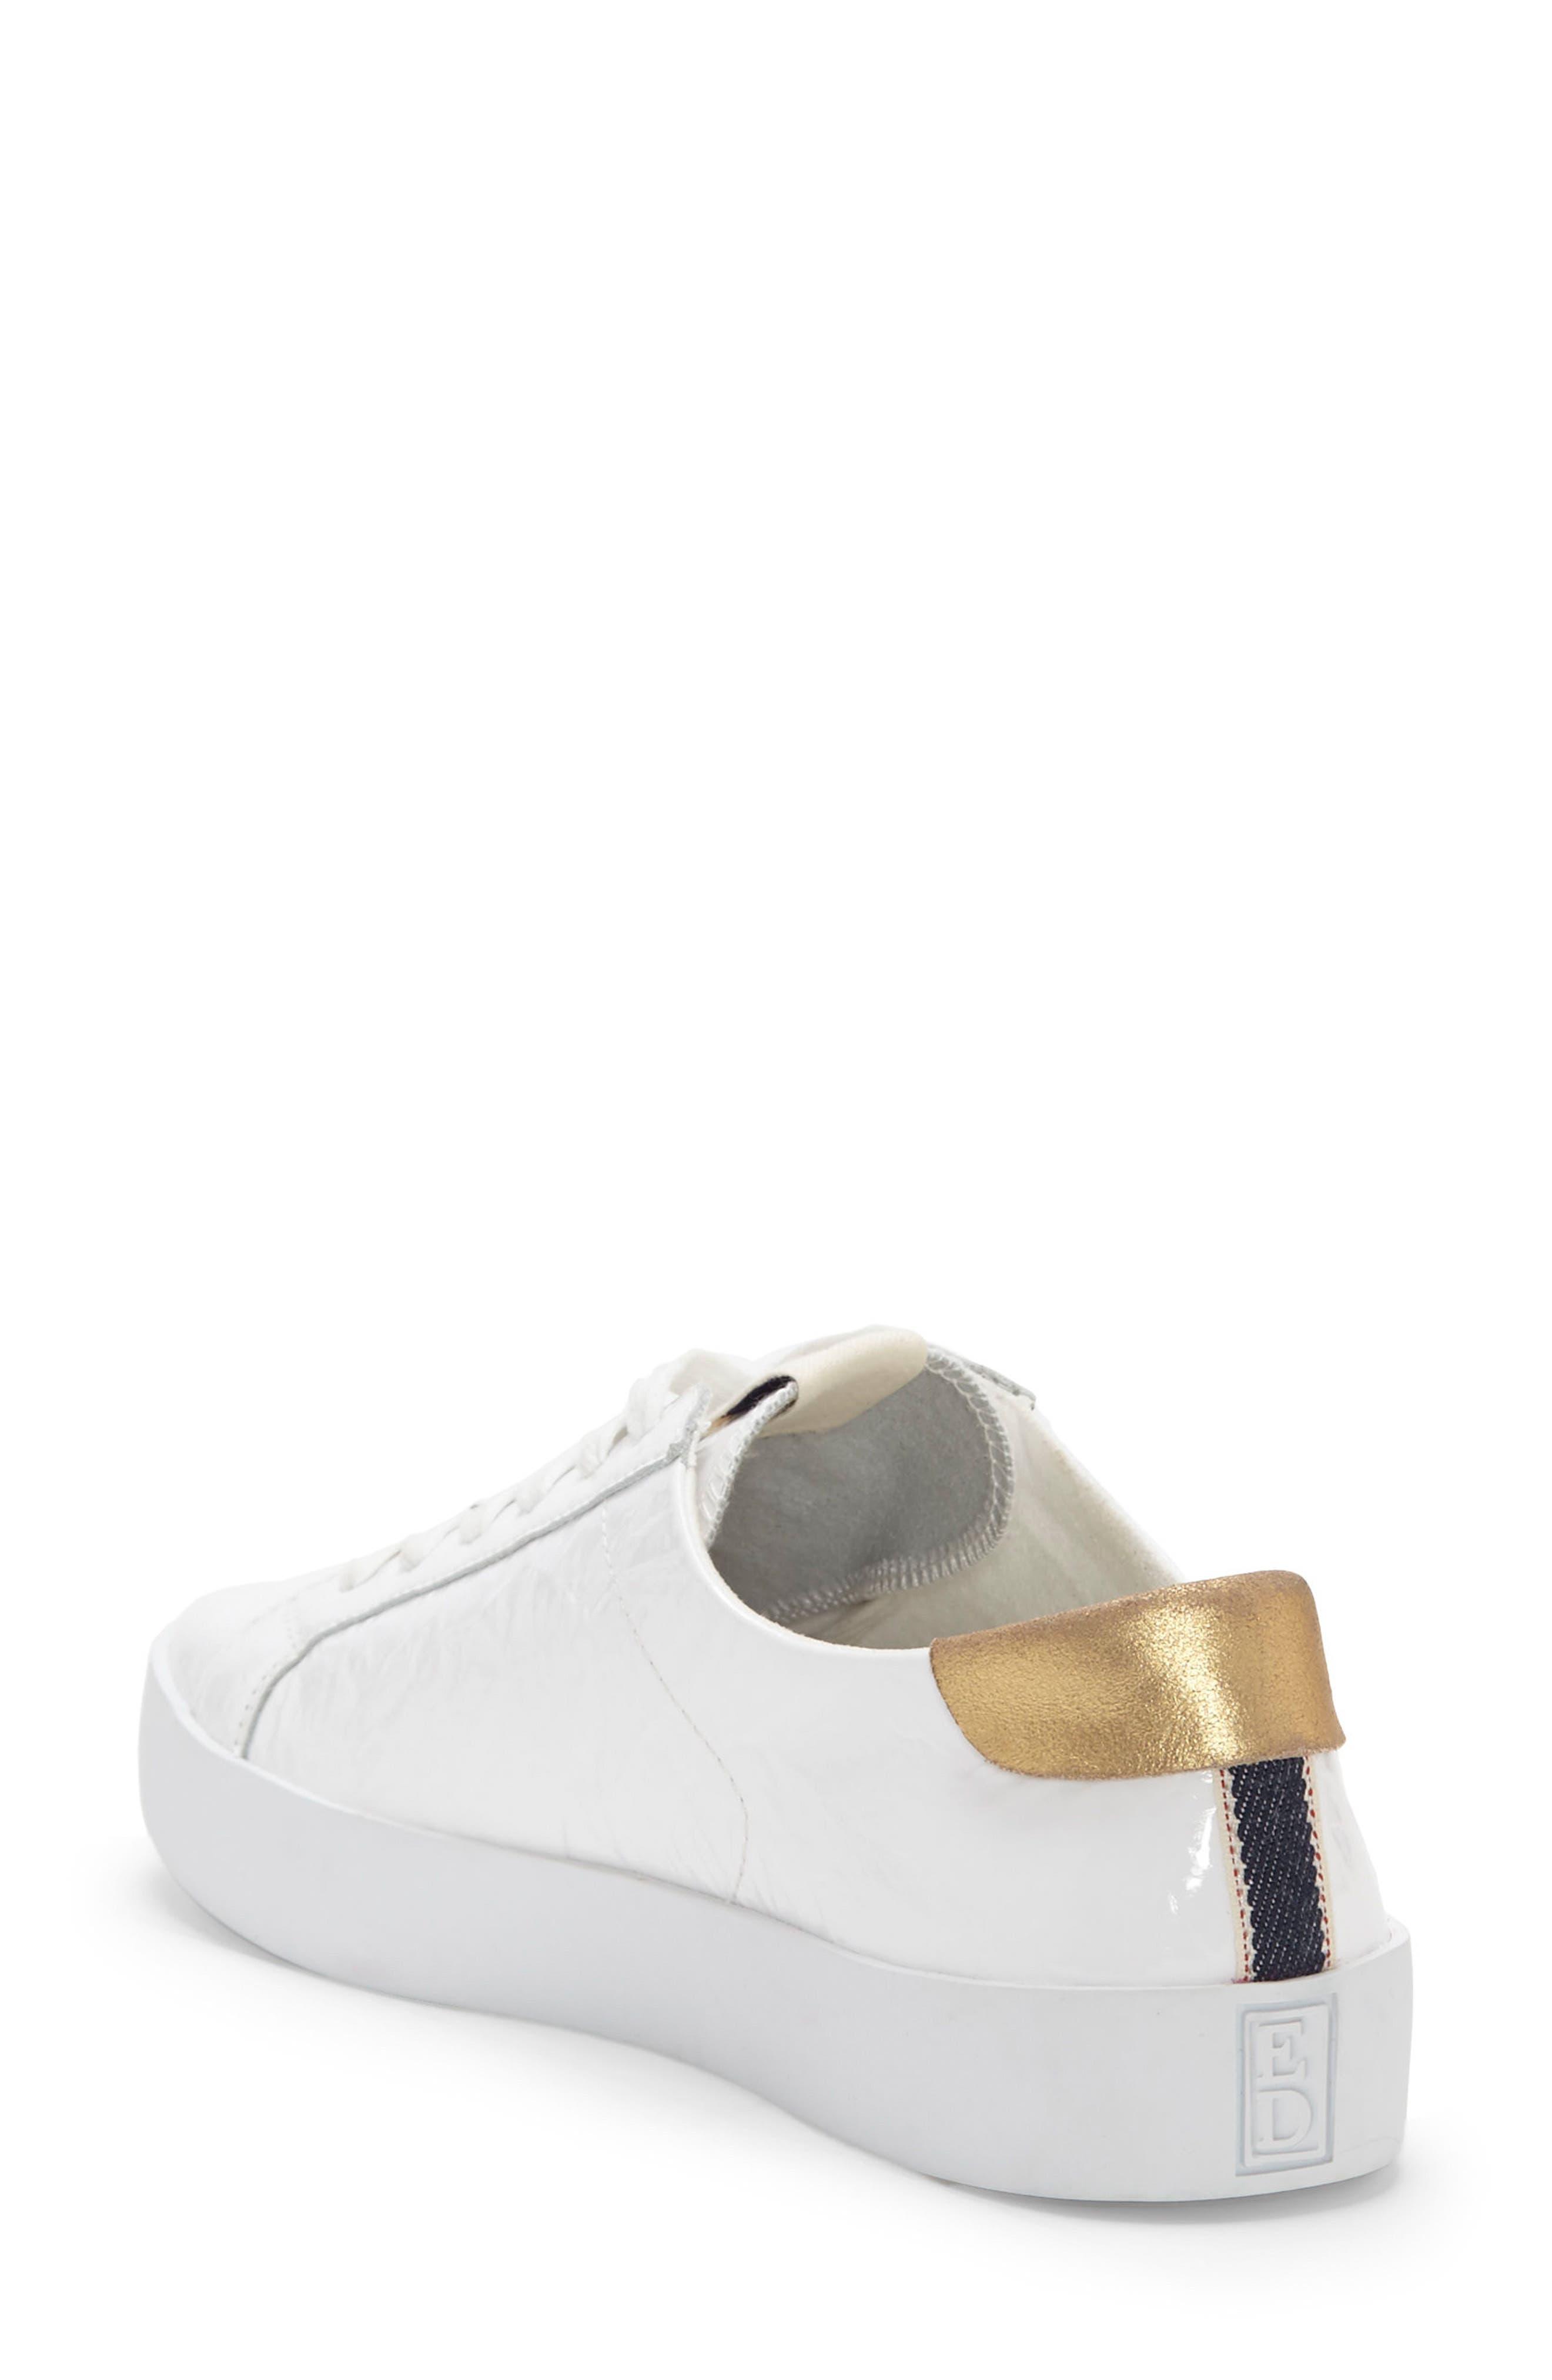 Gillen Sneaker,                             Alternate thumbnail 2, color,                             Pure White Crinkled Patent